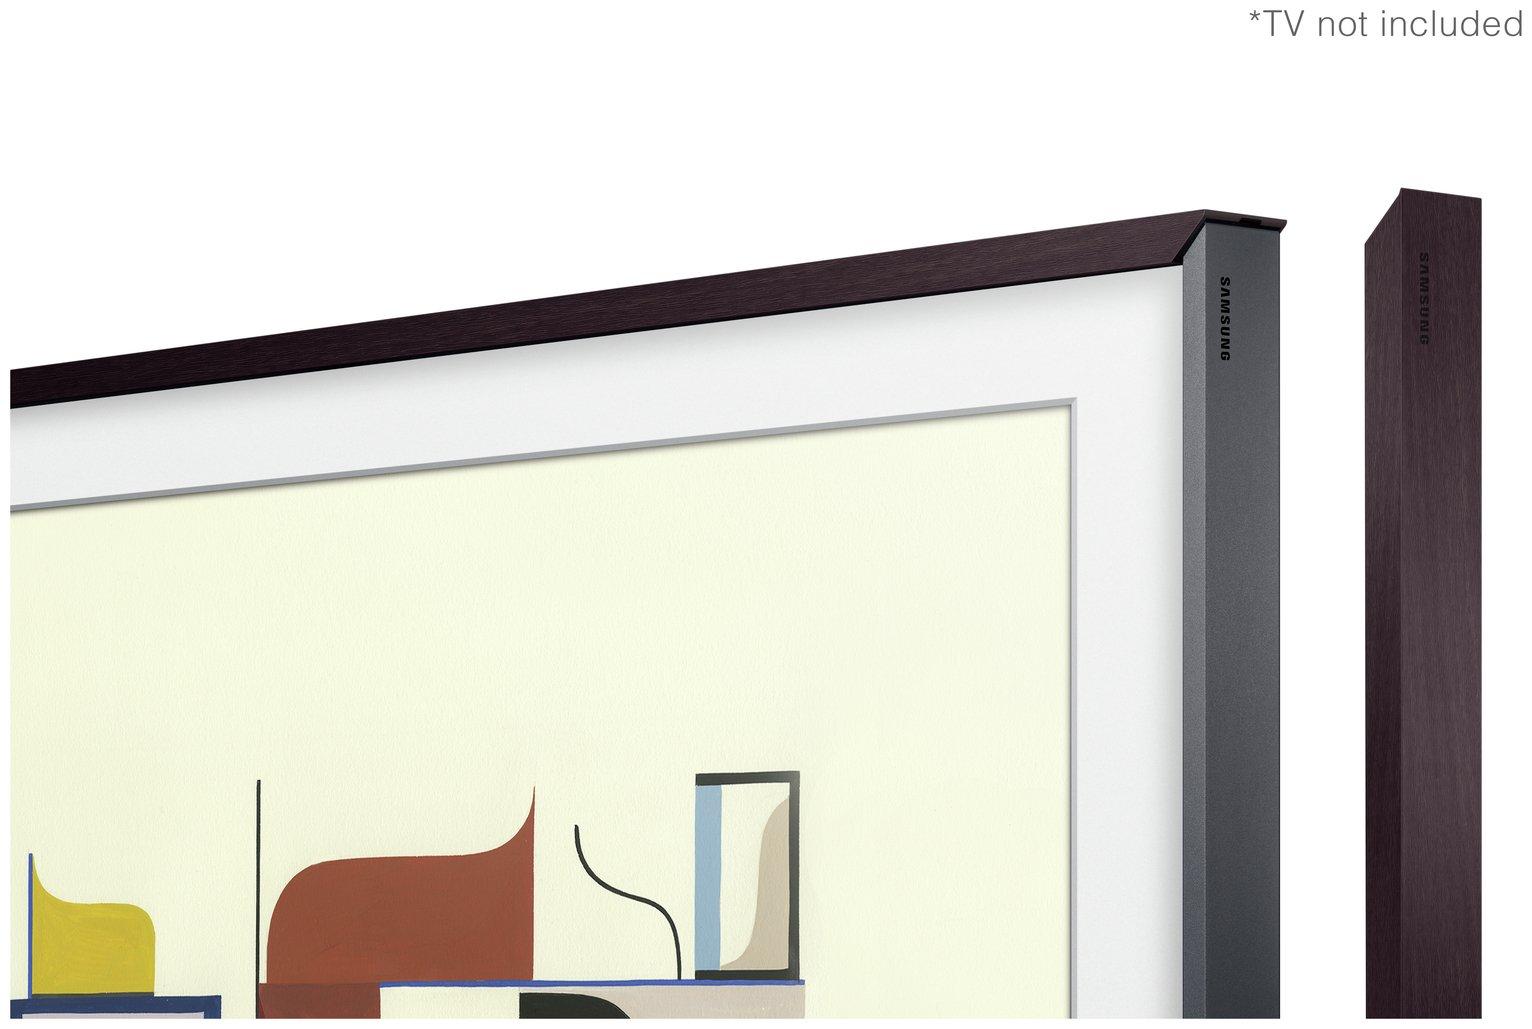 Samsung Customisable Bezel for The Frame 65 Inch TV - Brown